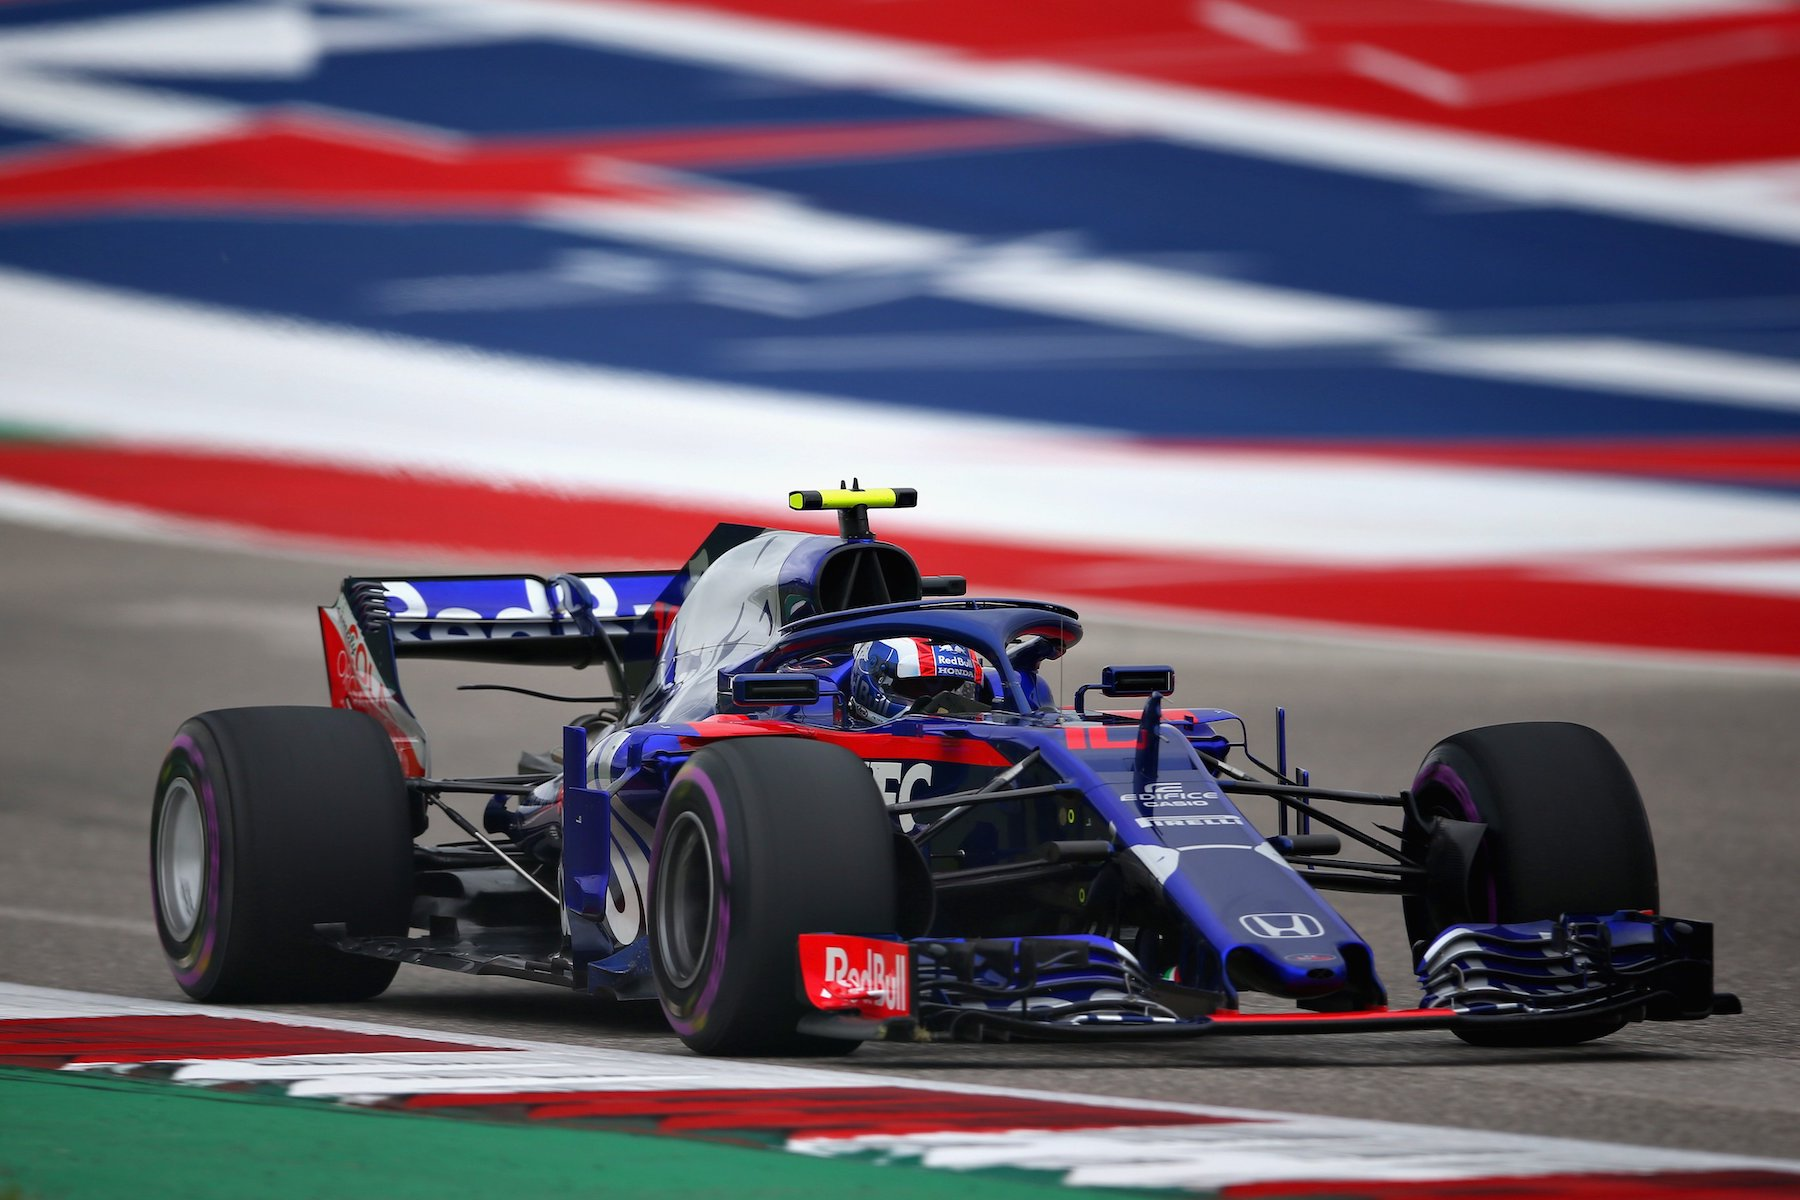 G 2018 Pierre Gasly | Toro Rosso STR13 | 2018 USGP Q3 1 copy.jpg